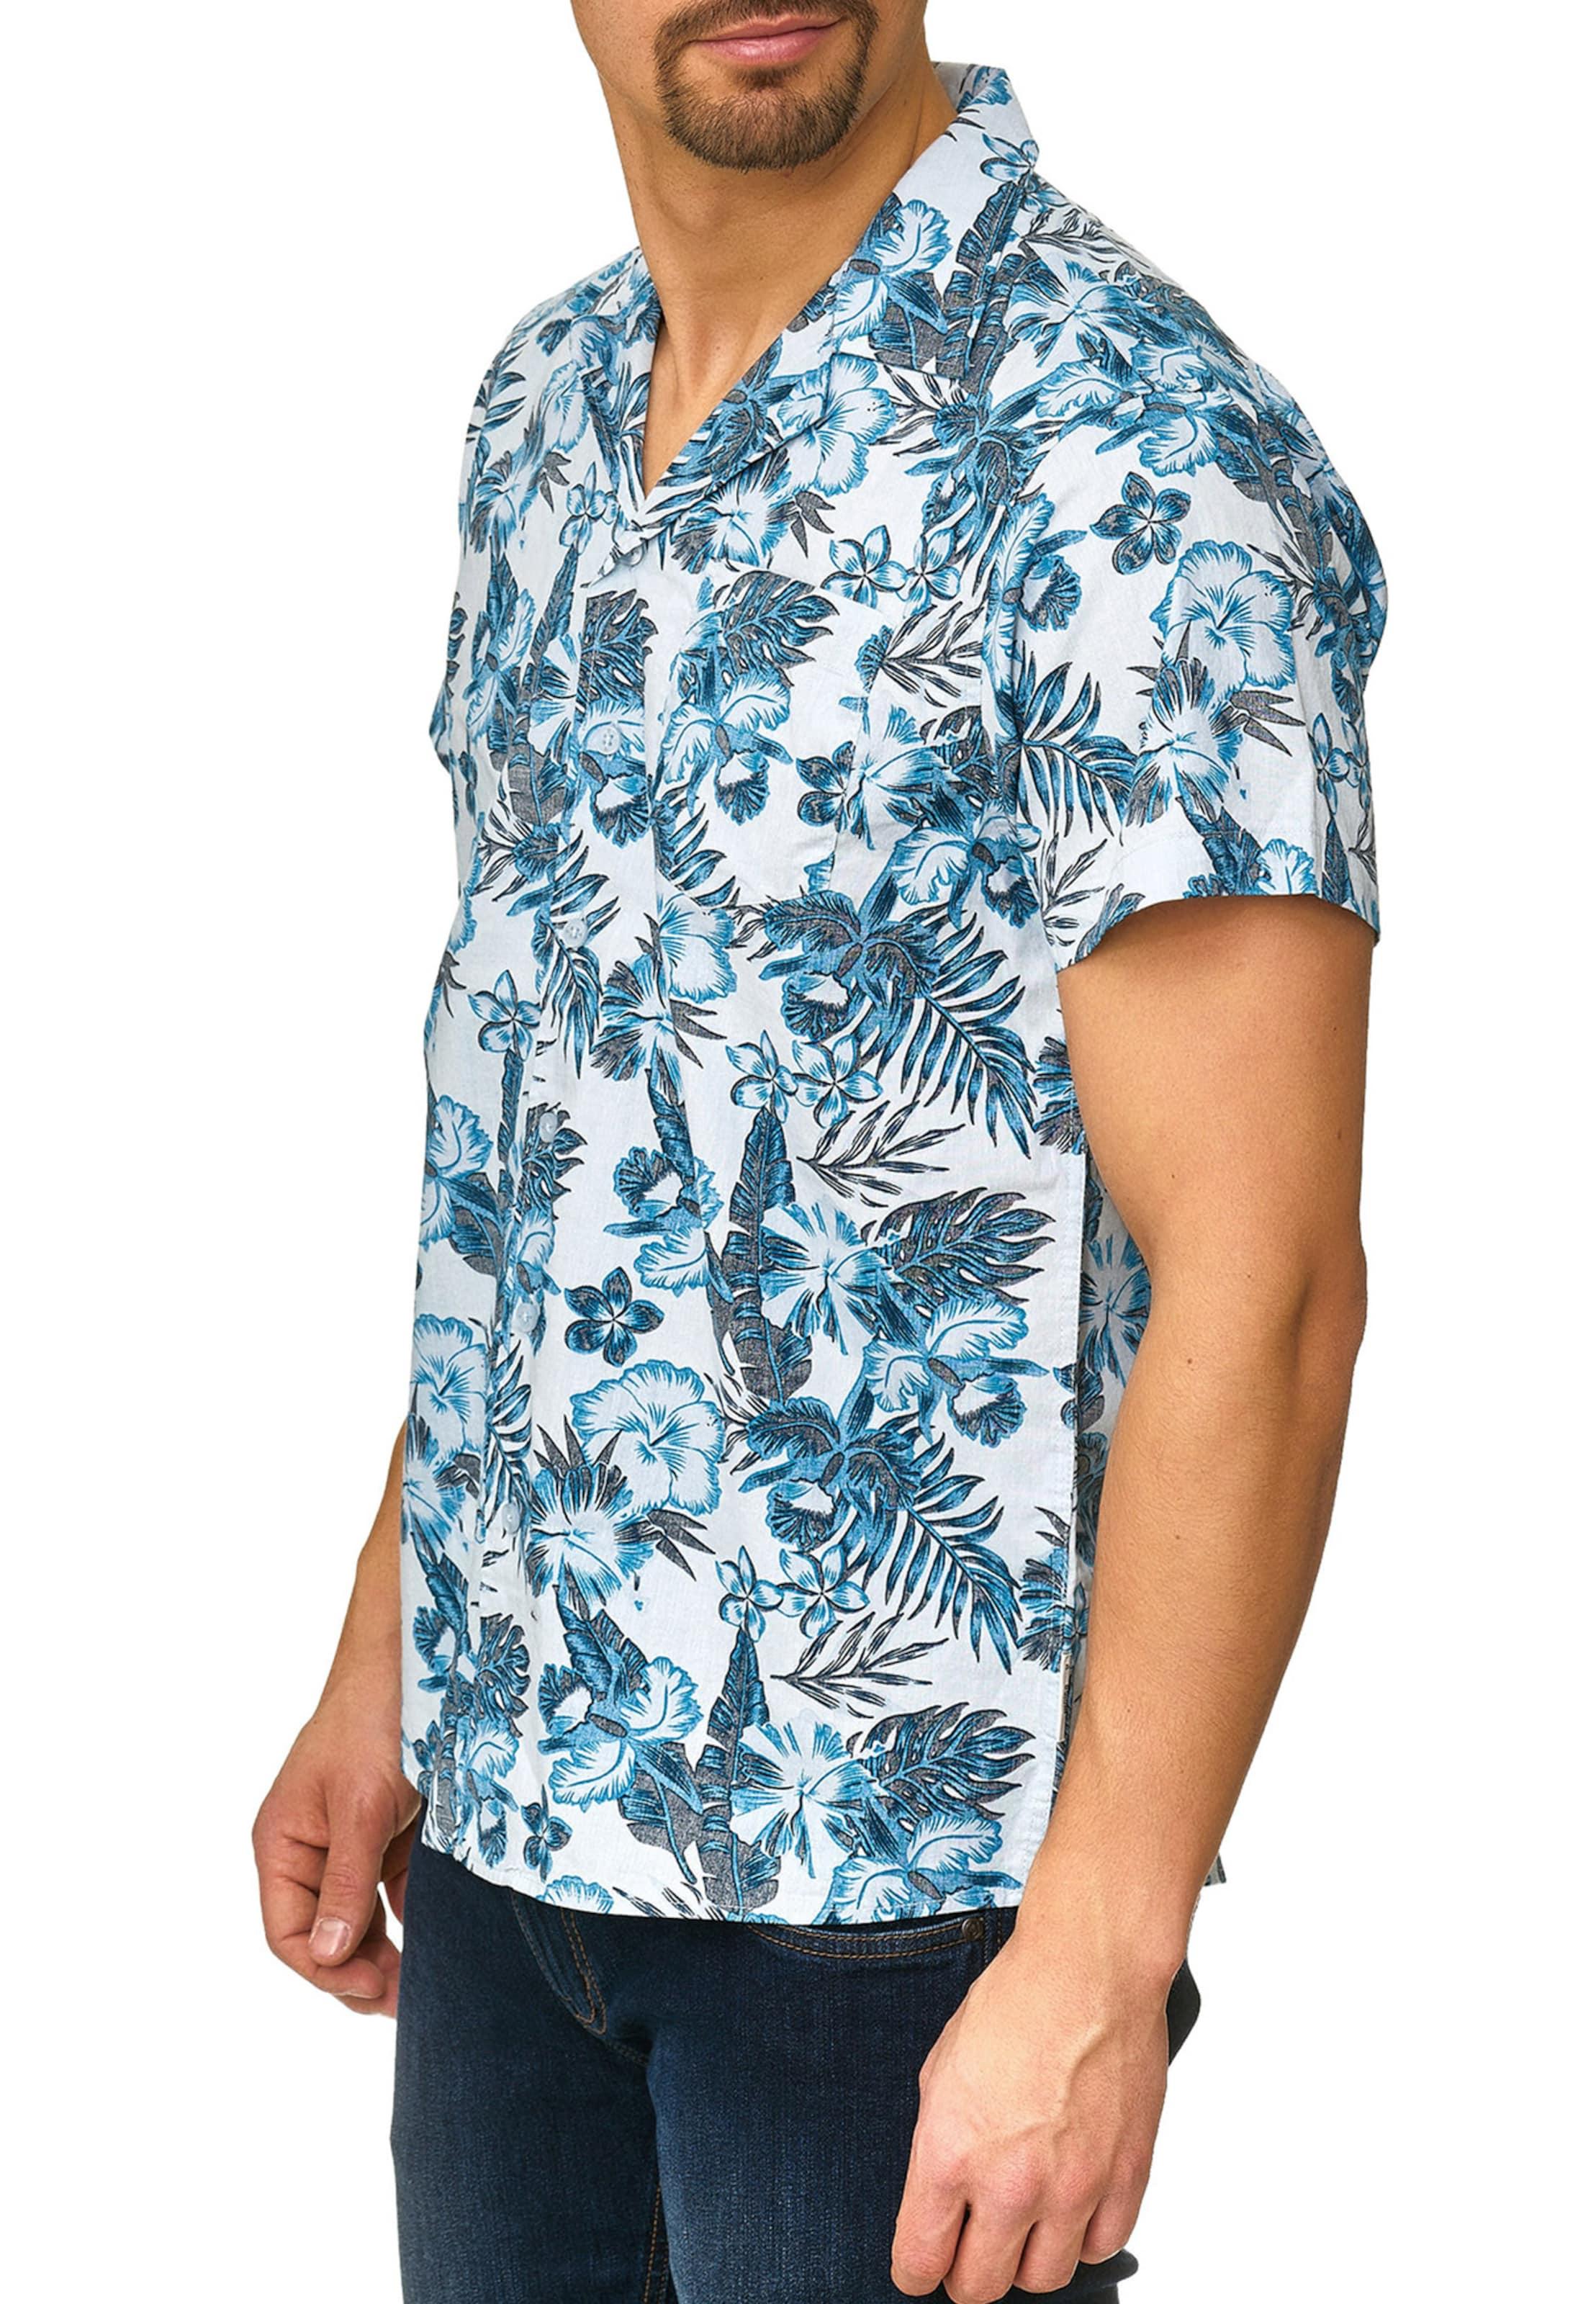 BlauWeiß In Indicode Jeans Hemd 'mcmillan' oedrCBWQx